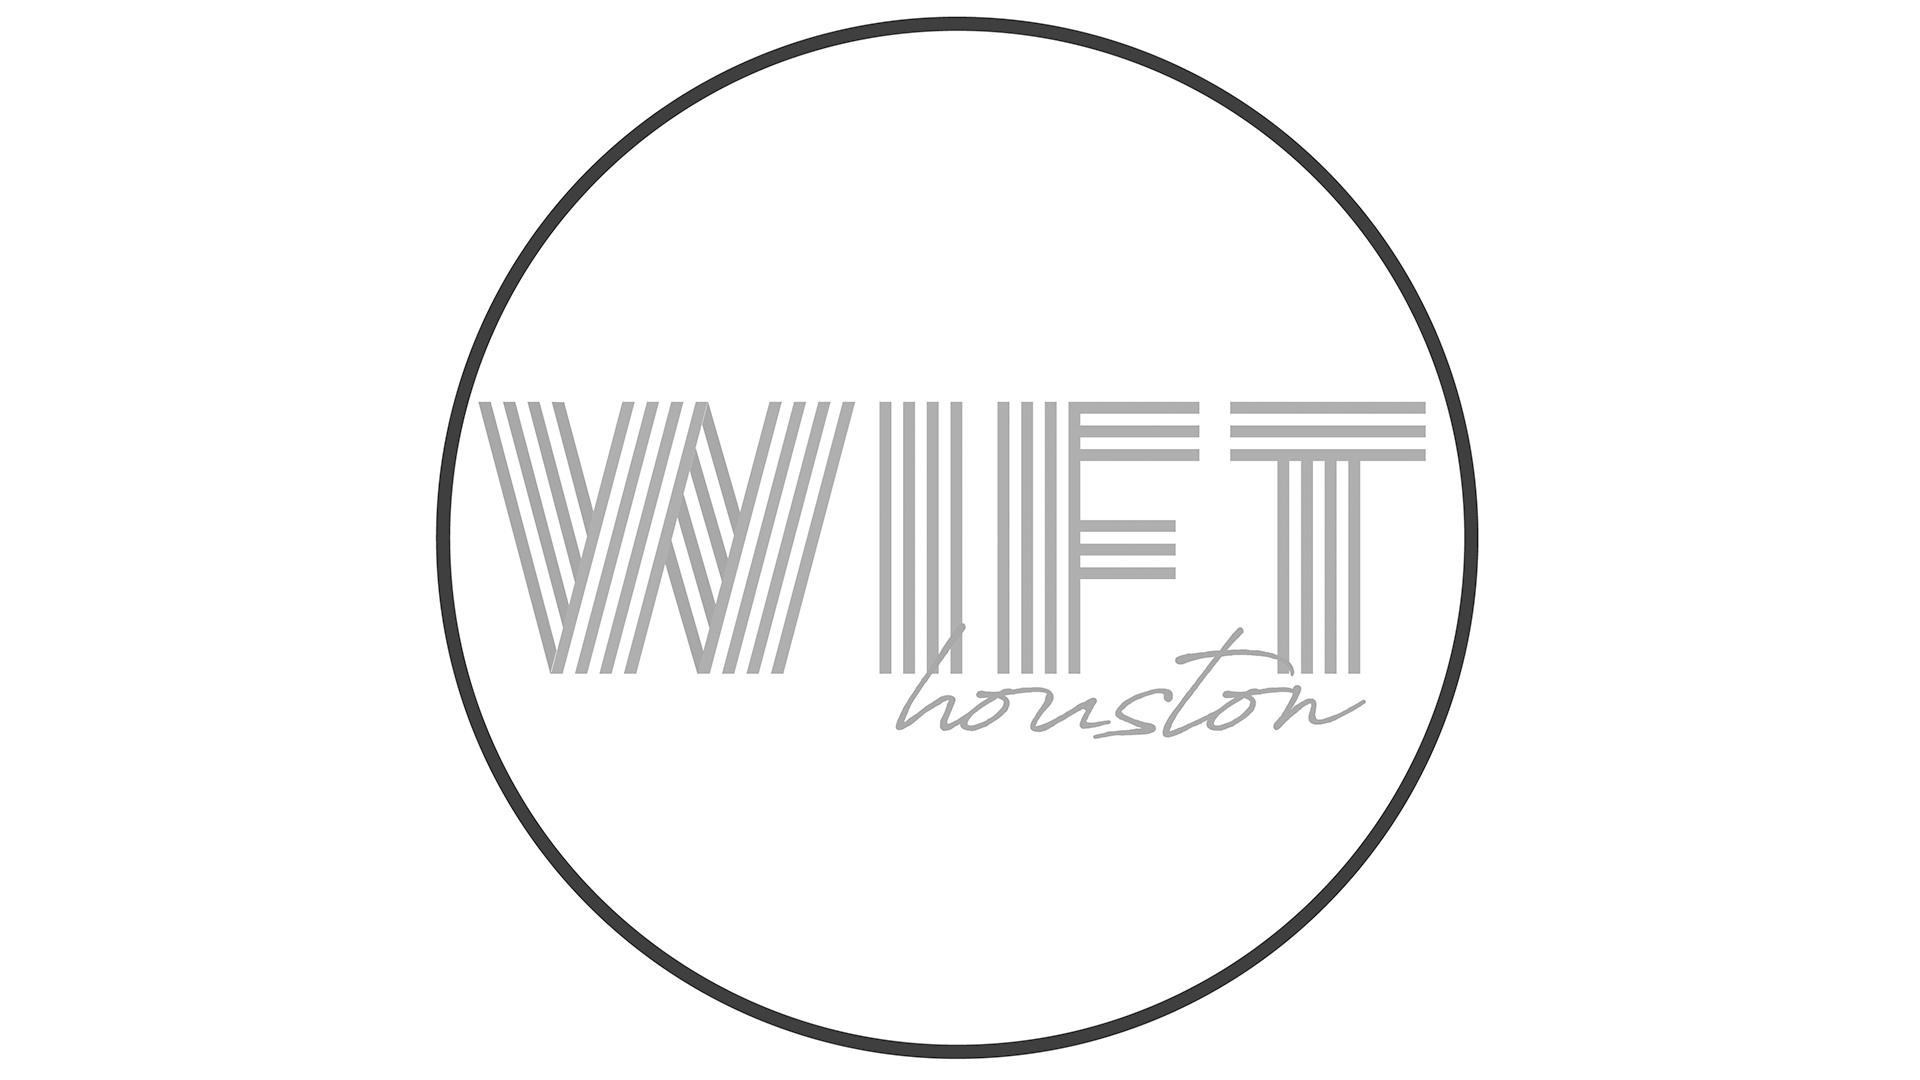 WIFT-Houston_Partner_1920x1080